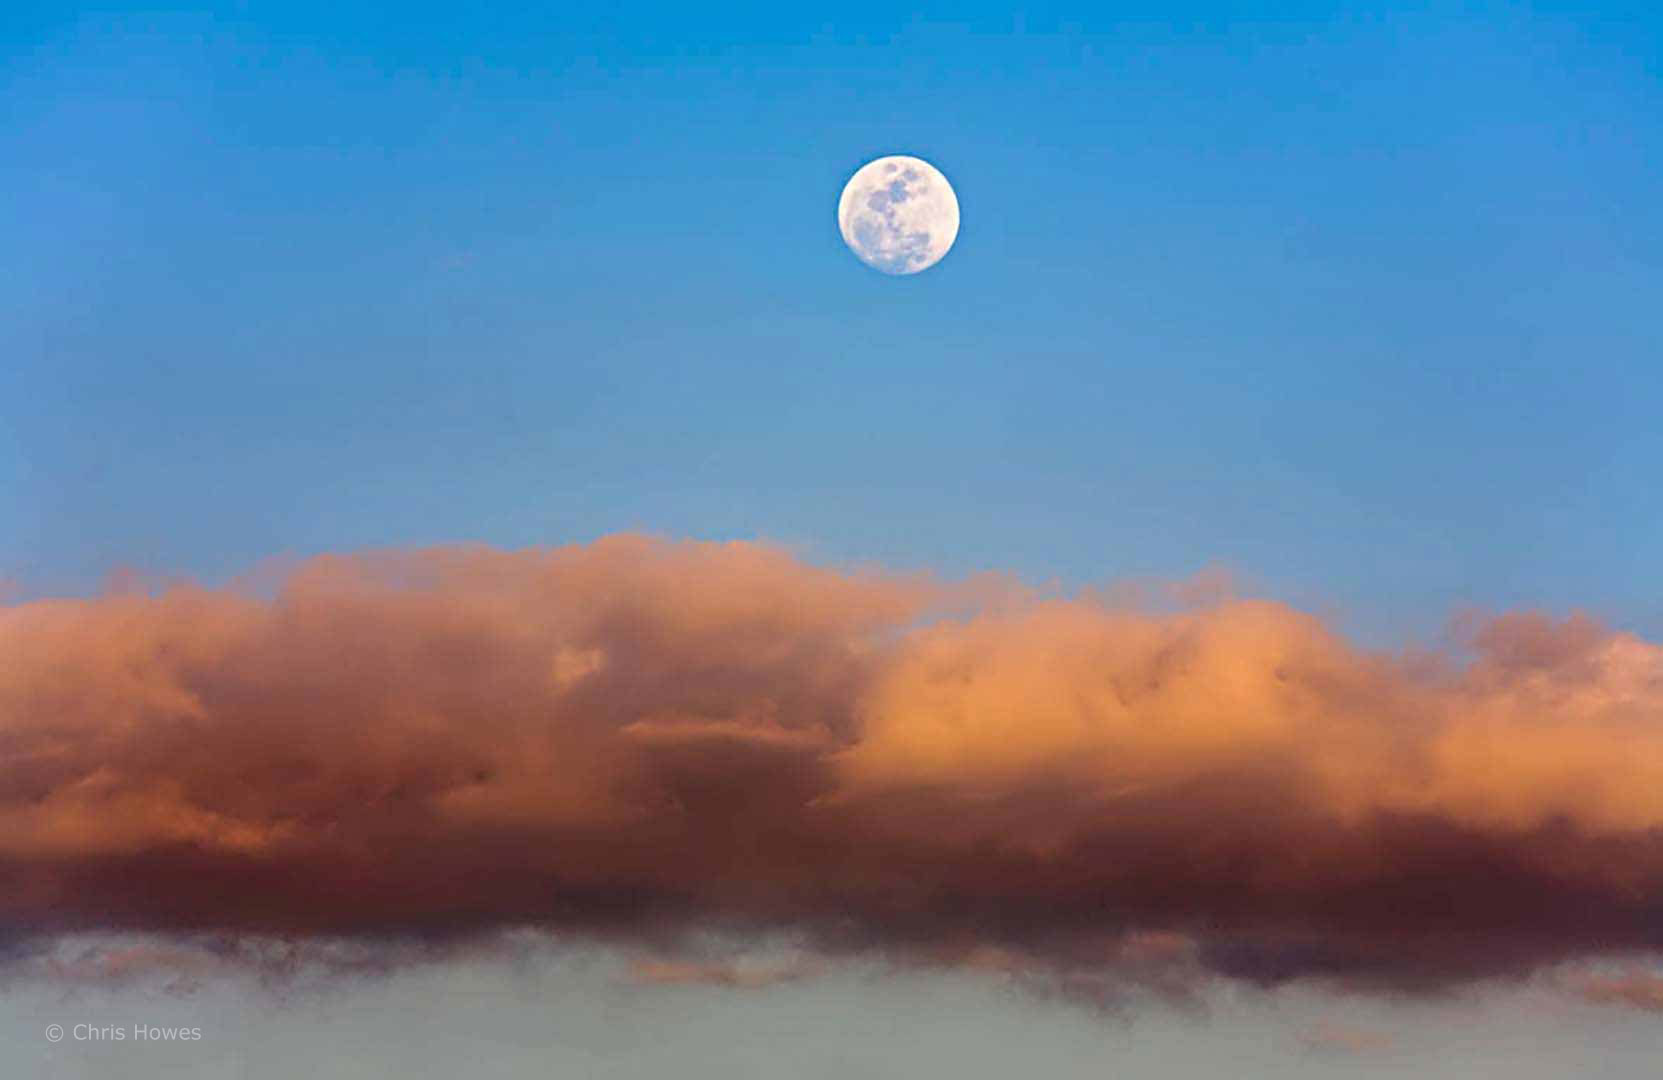 Moonrise, Maspalomas, Gran Canaria